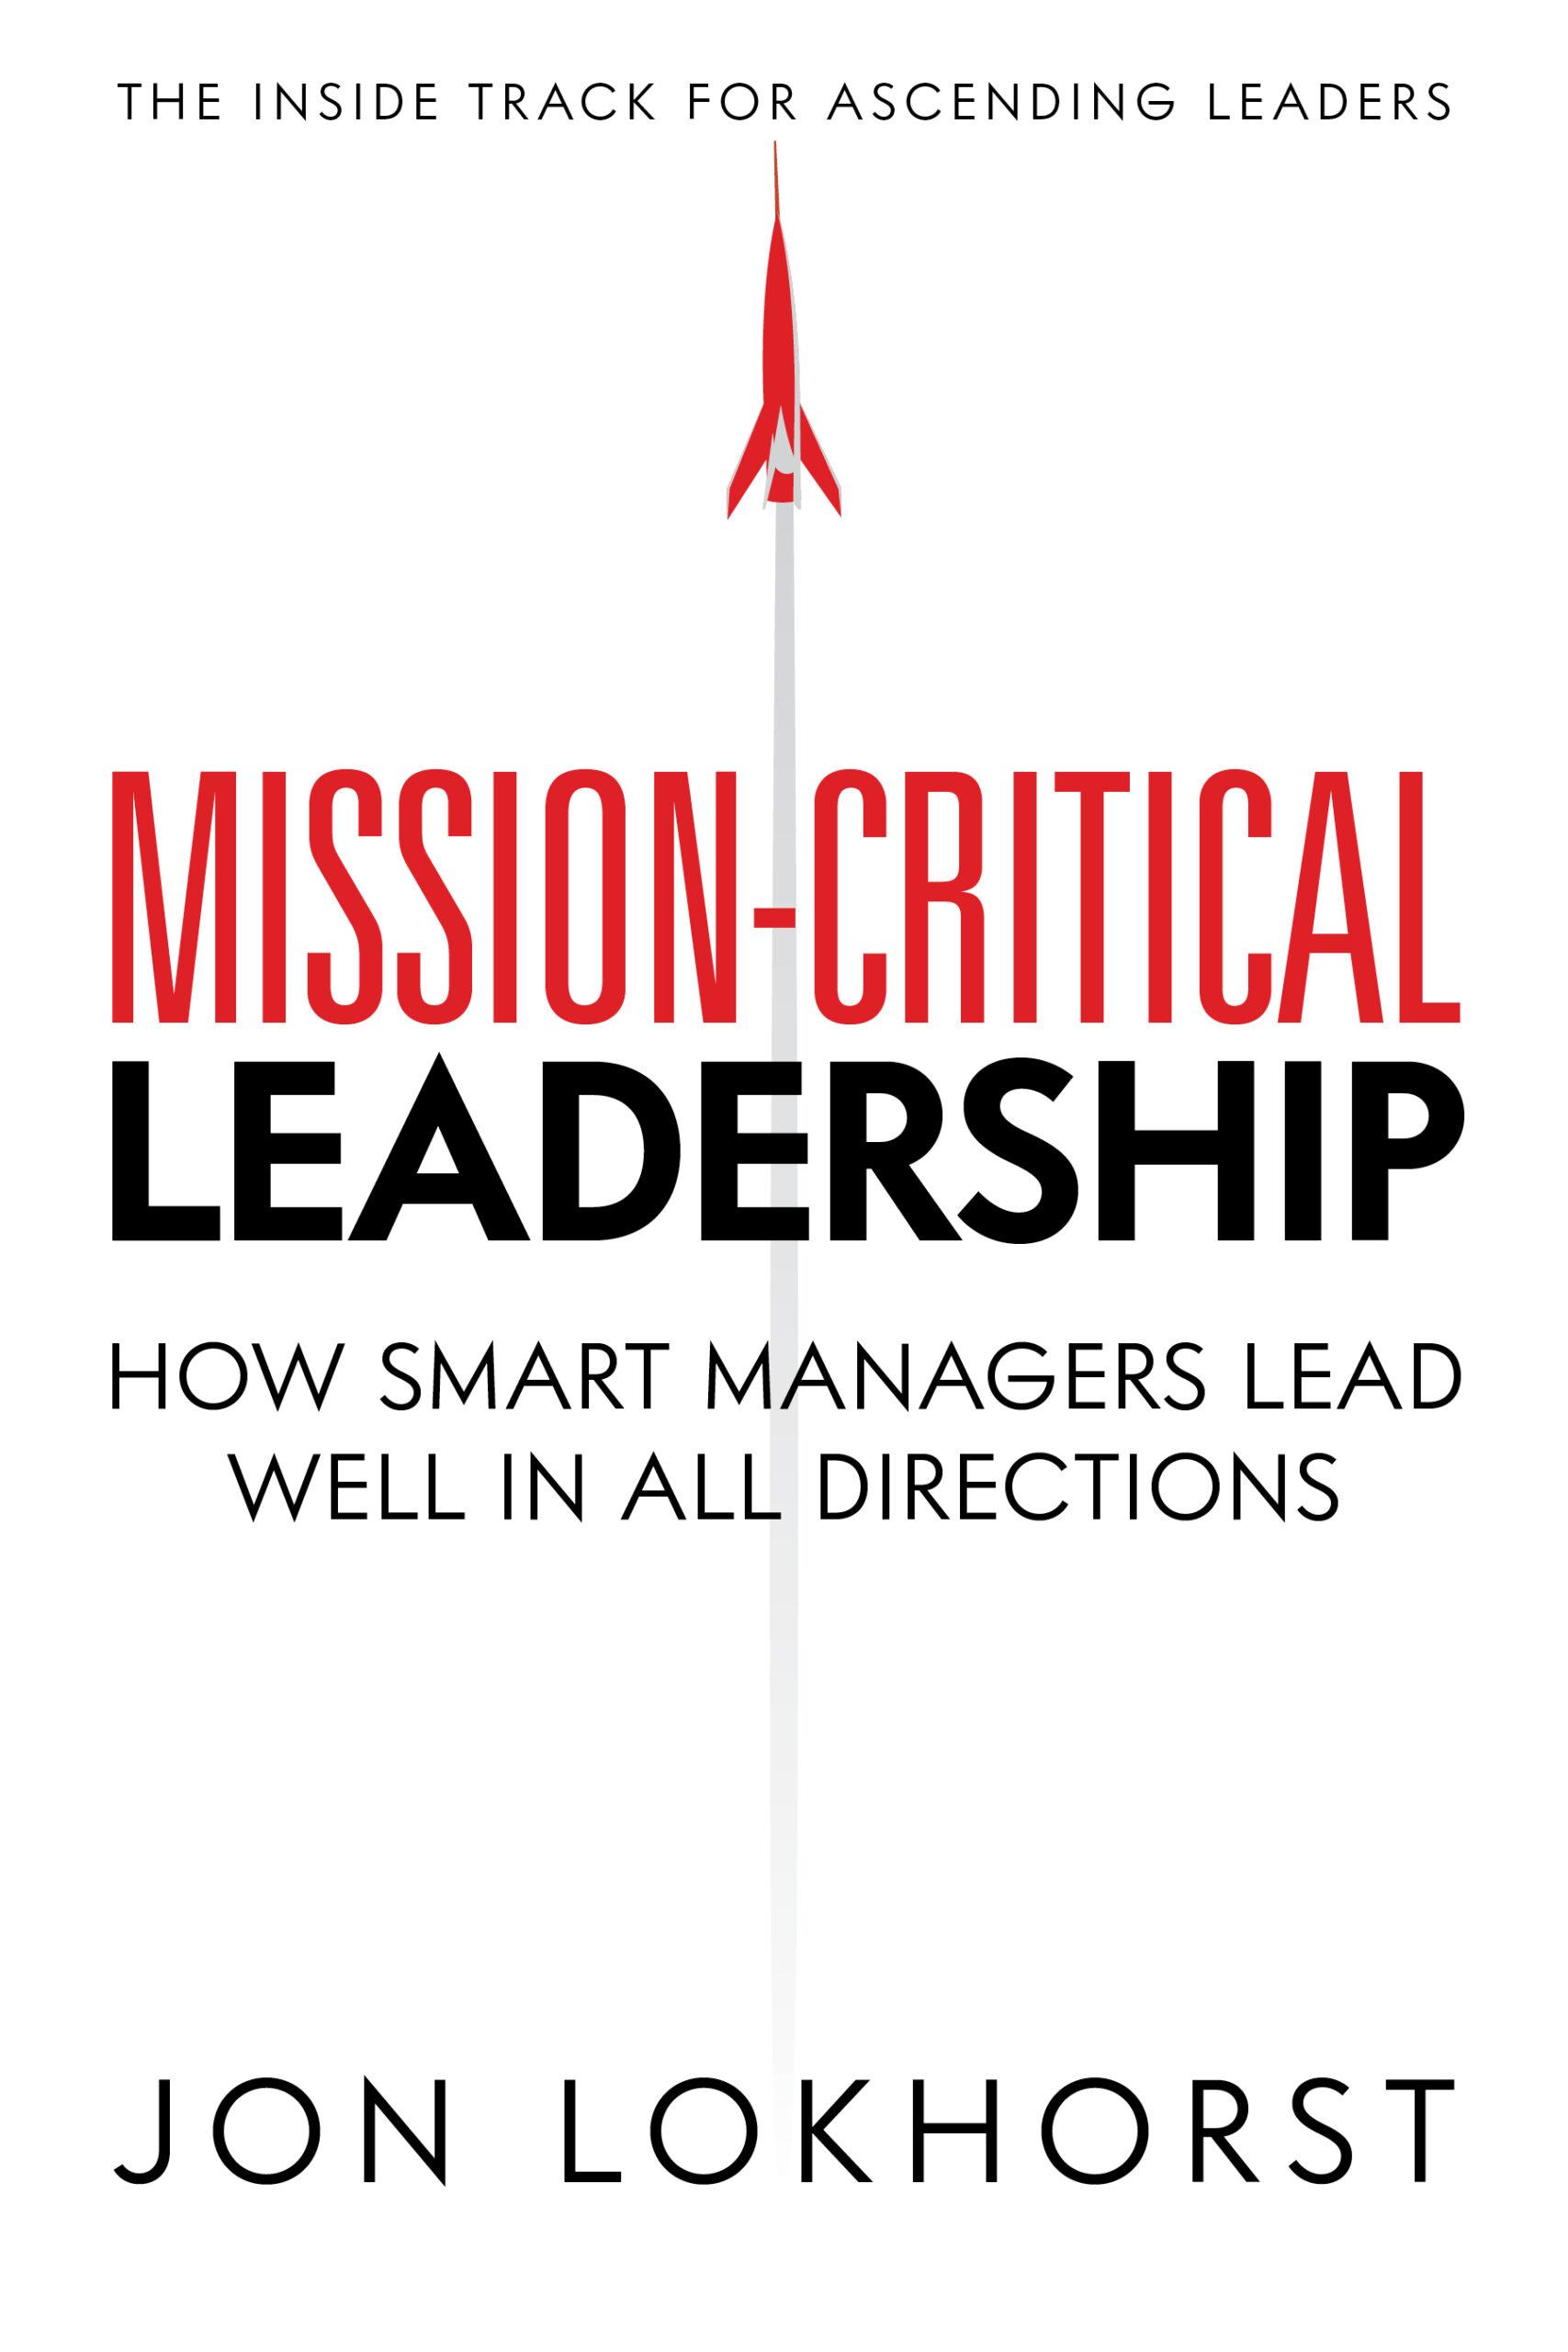 Mission-Critical Leadership